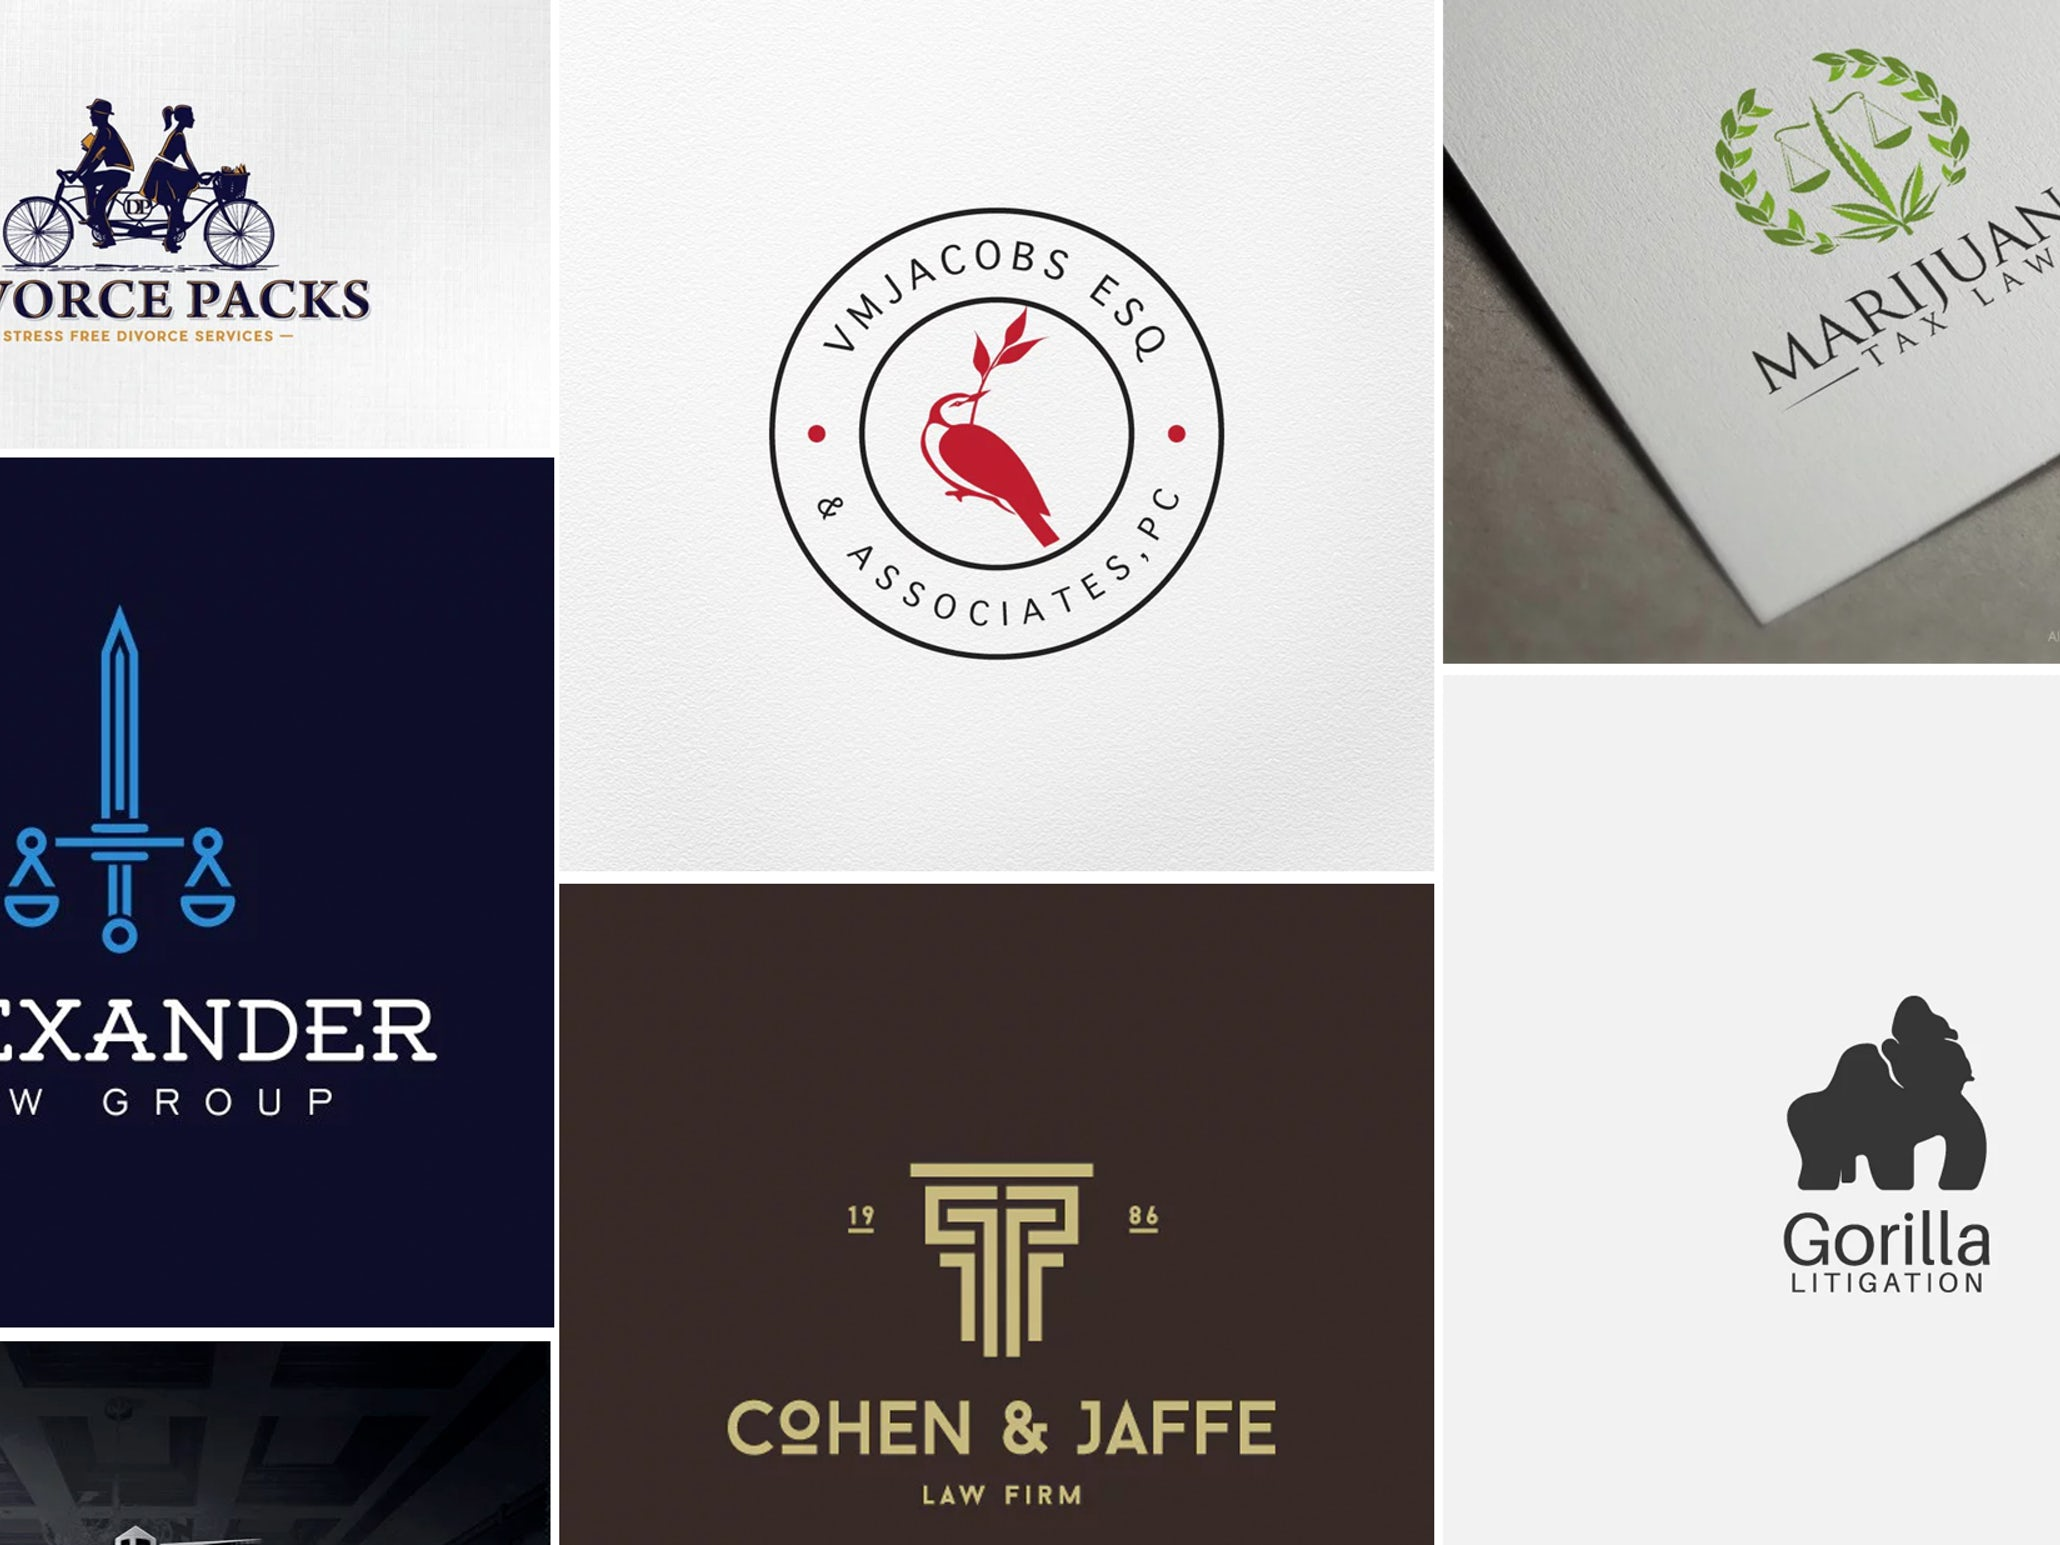 31 Law Firm Logos That Raise The Bar 99designs